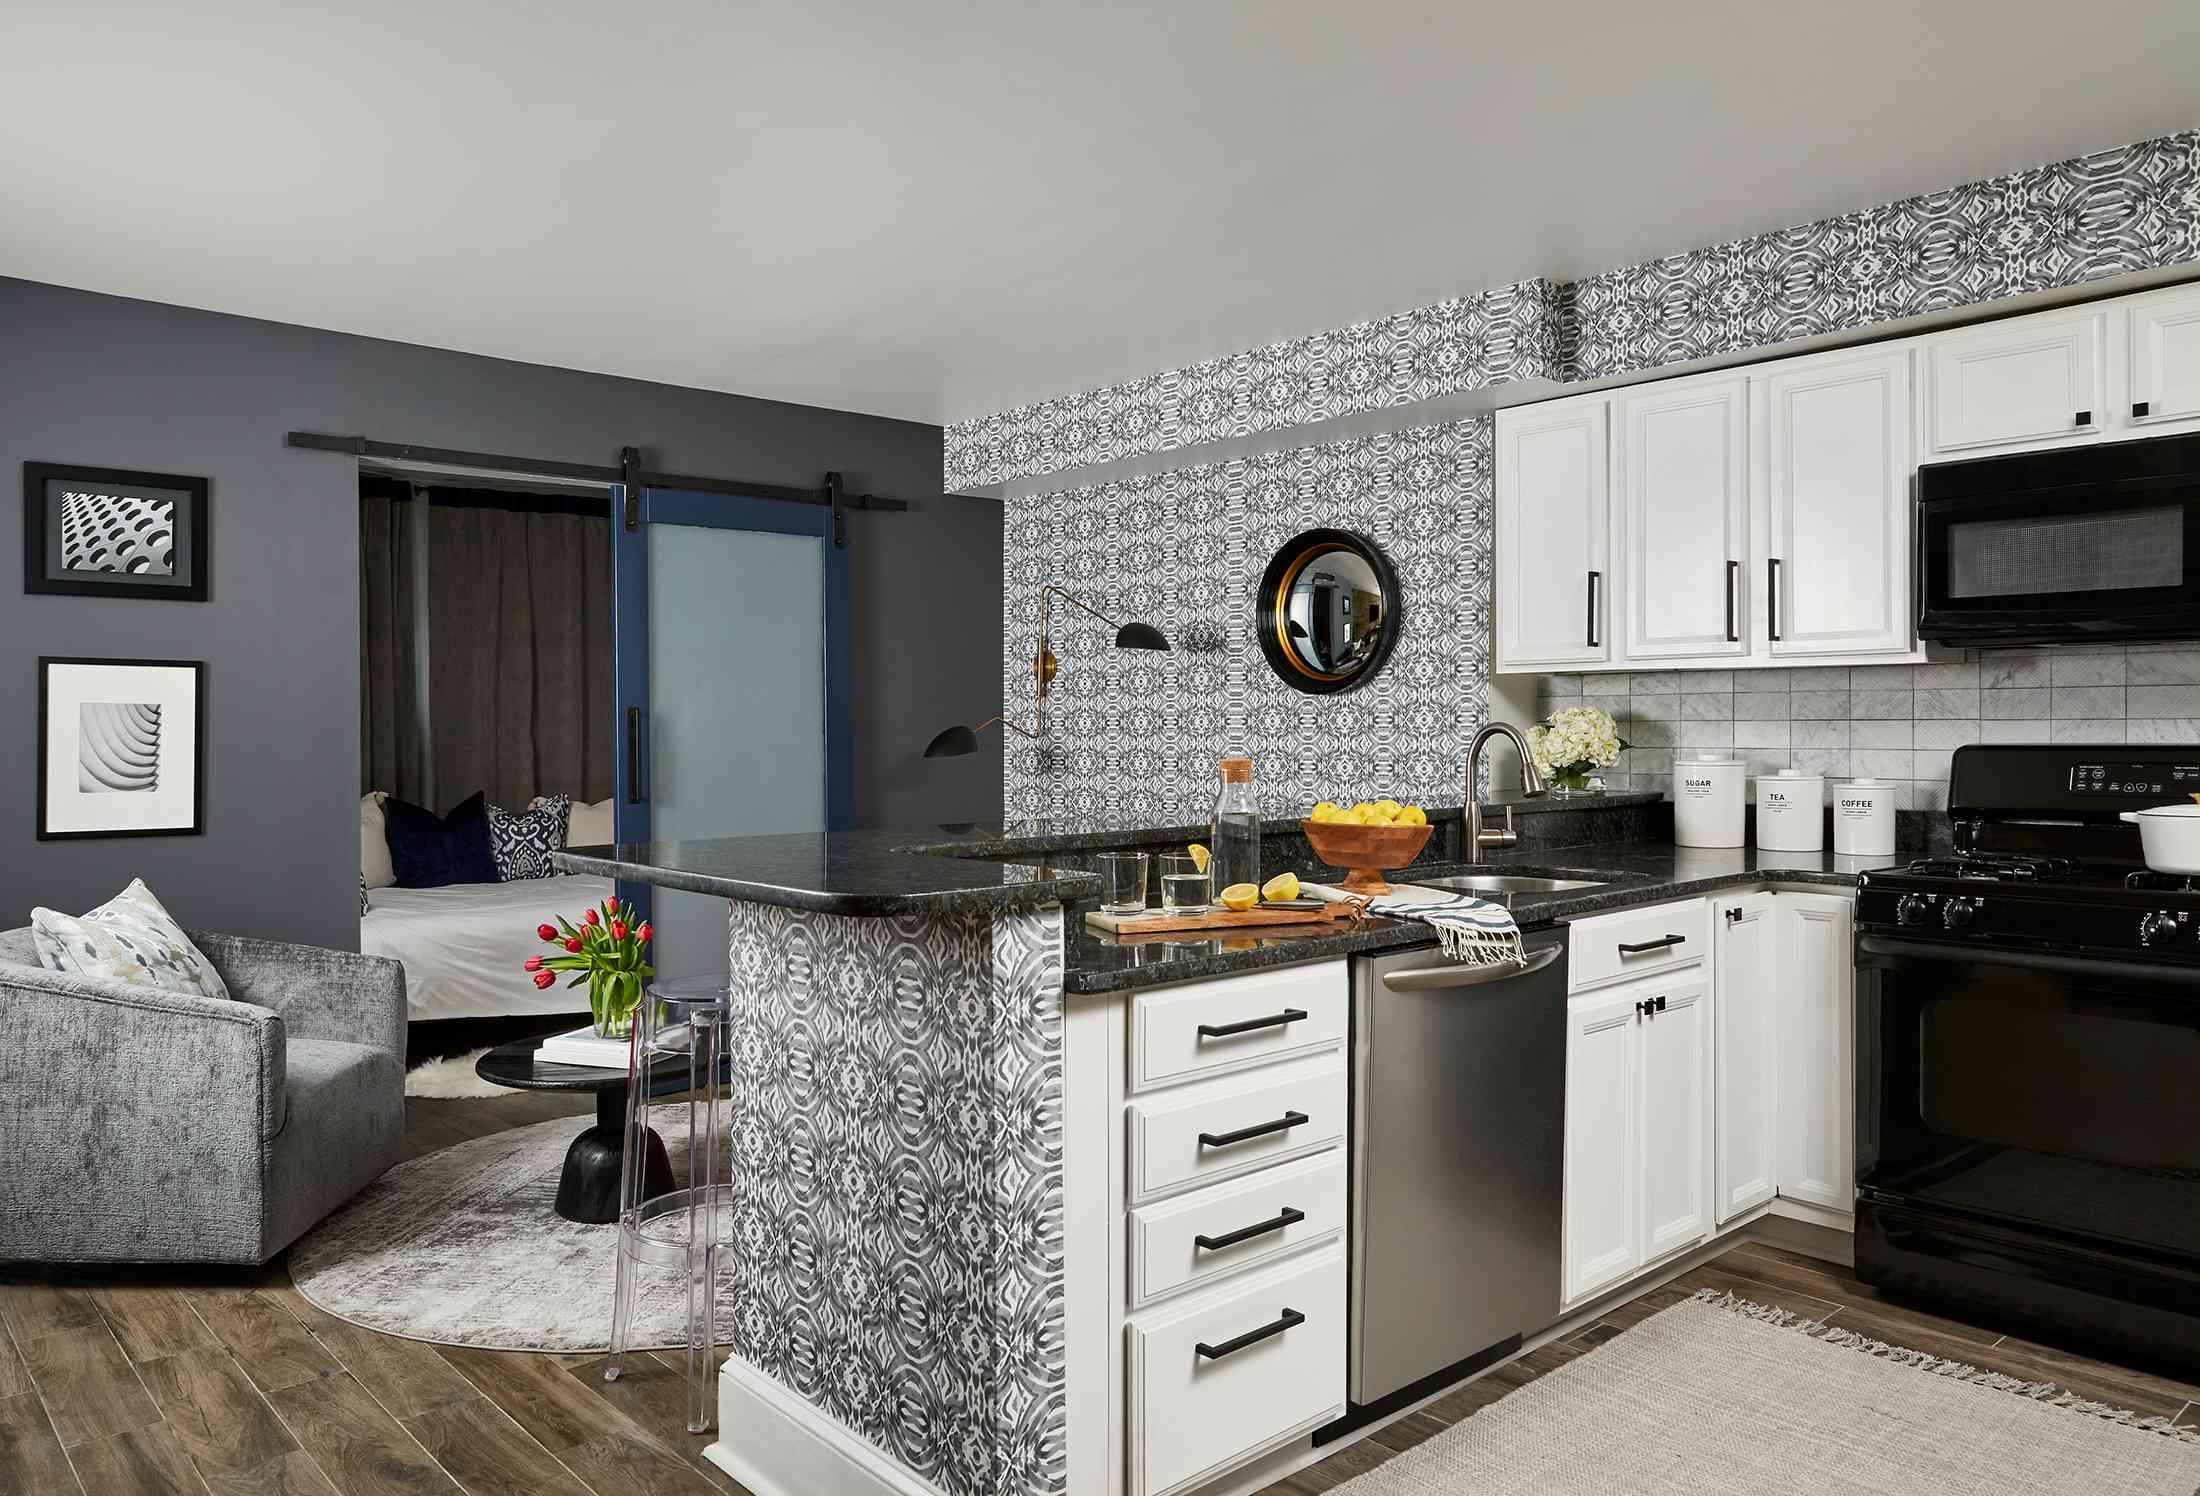 Duke Ellington home tour - kitchen area with white cabinets and black appliances